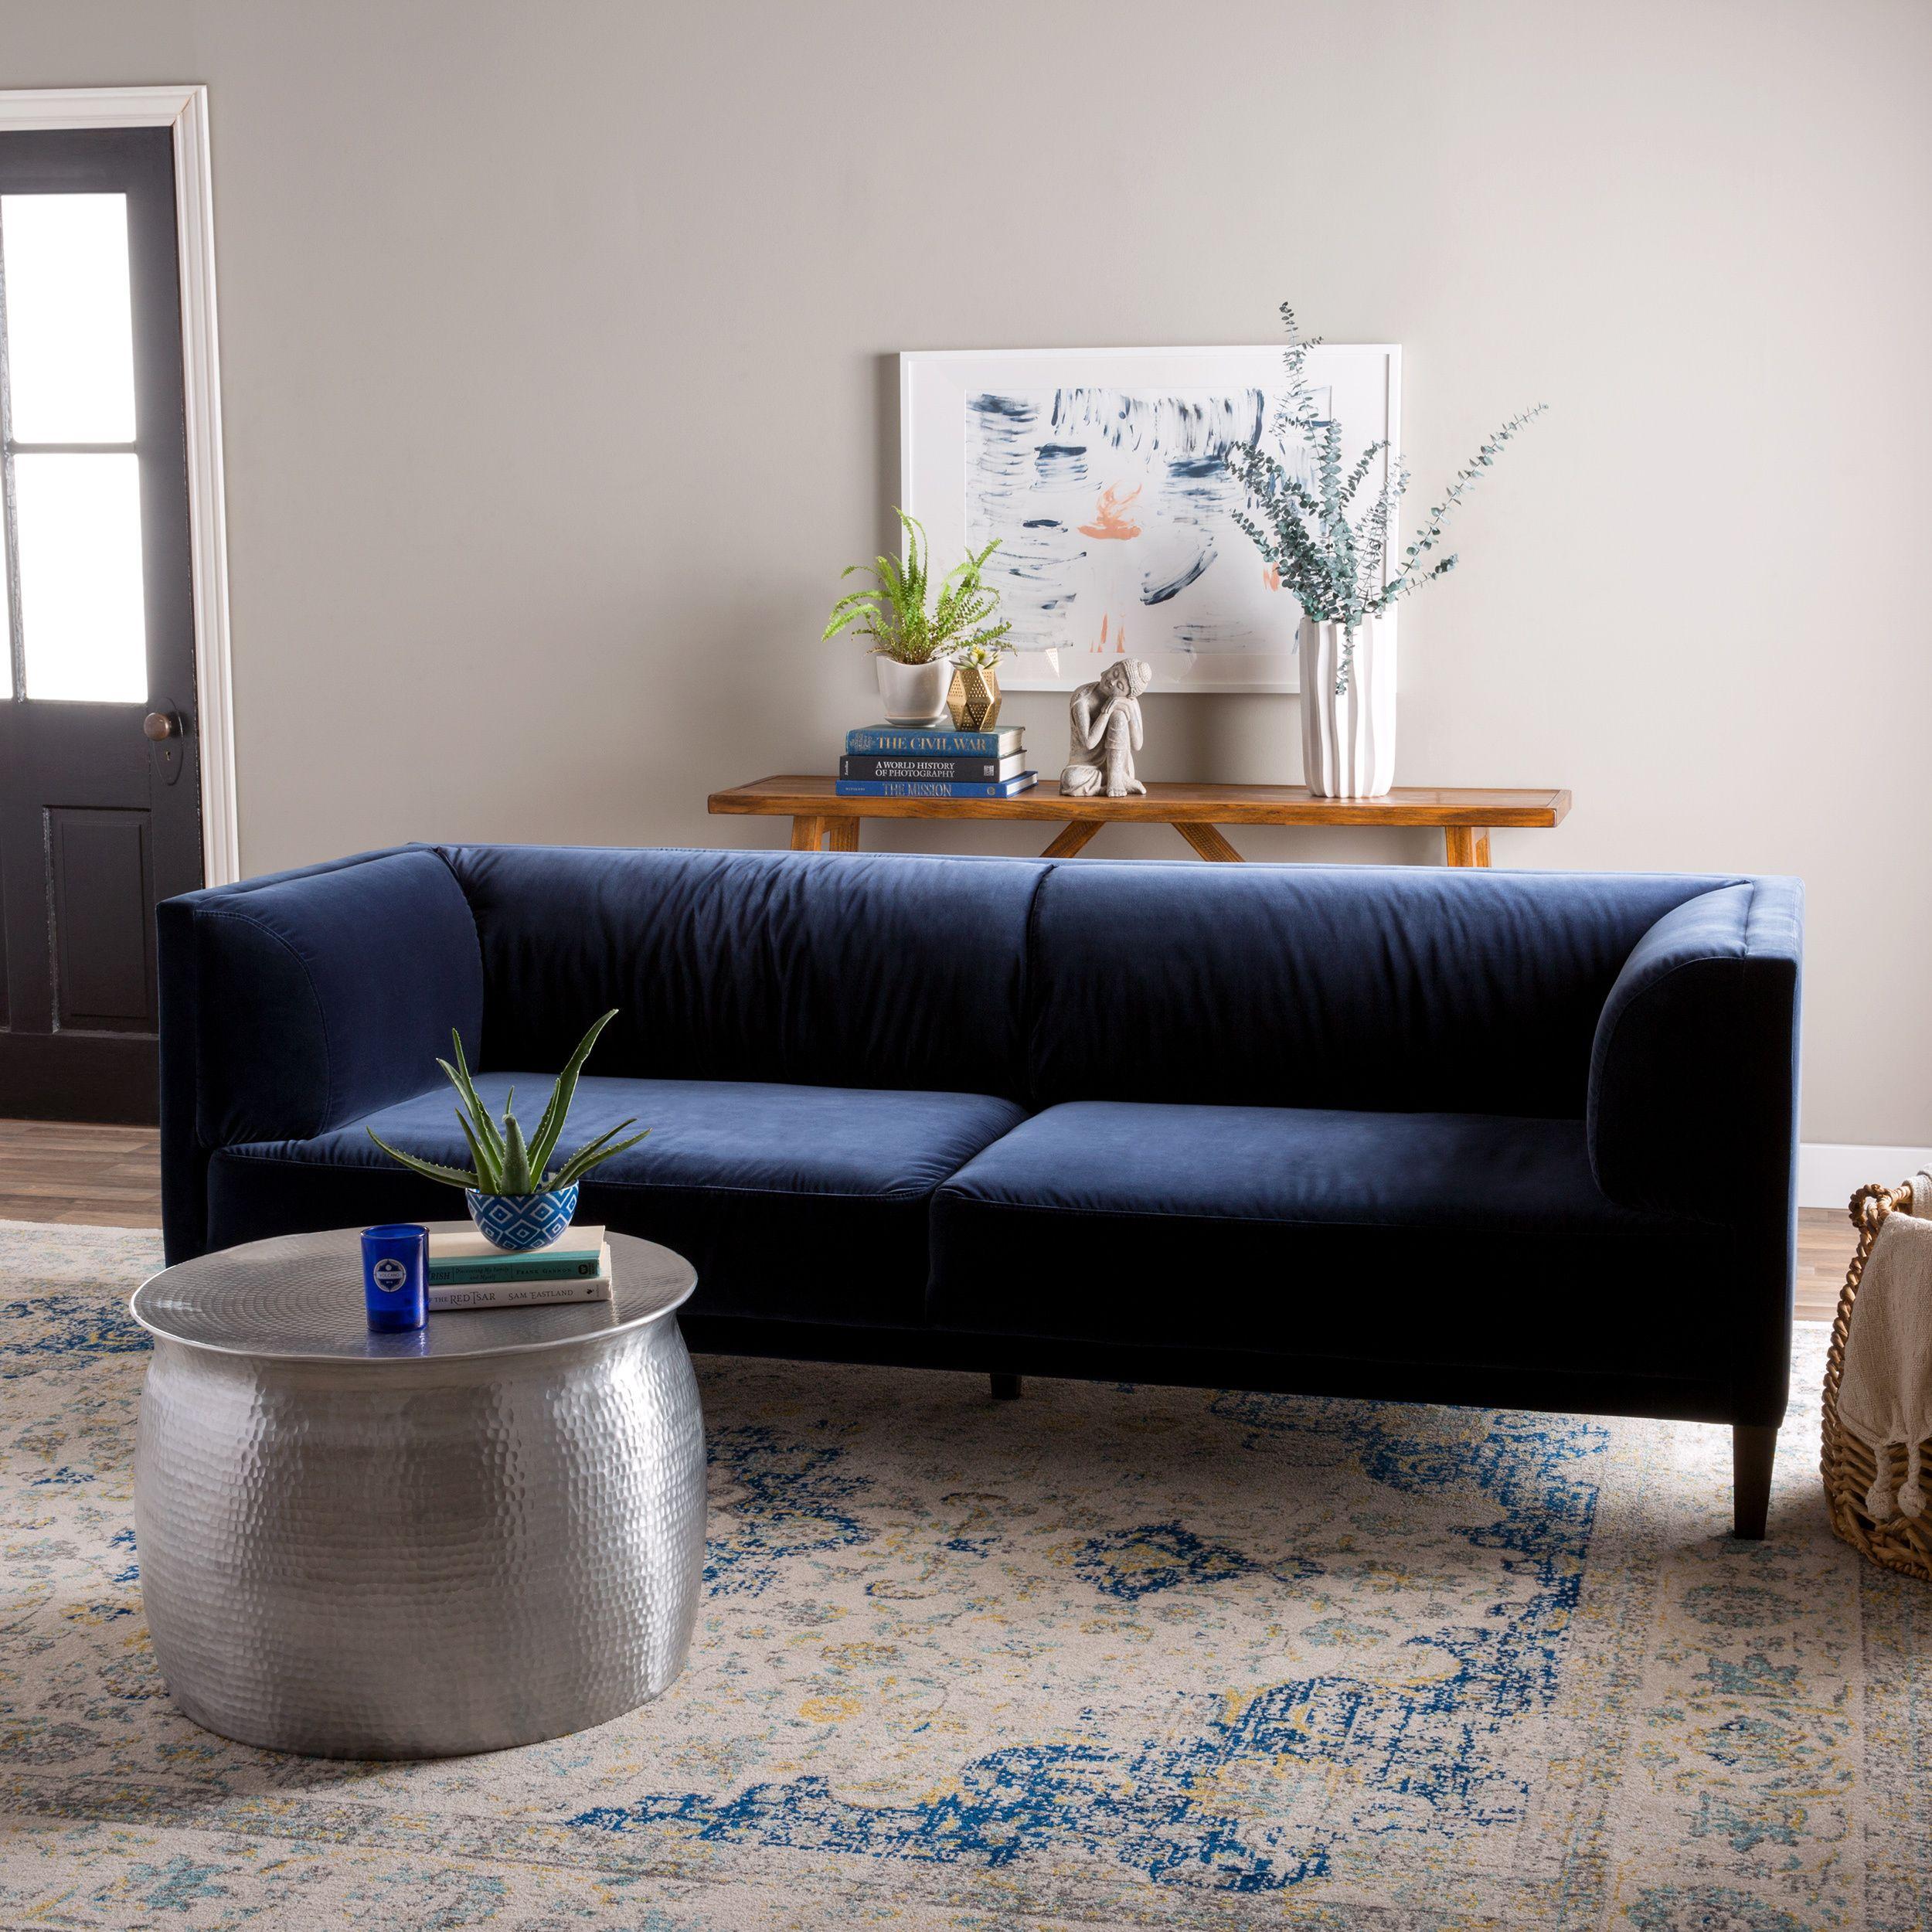 The nimbus velvet navy sofa creates a modern yet traditional focal